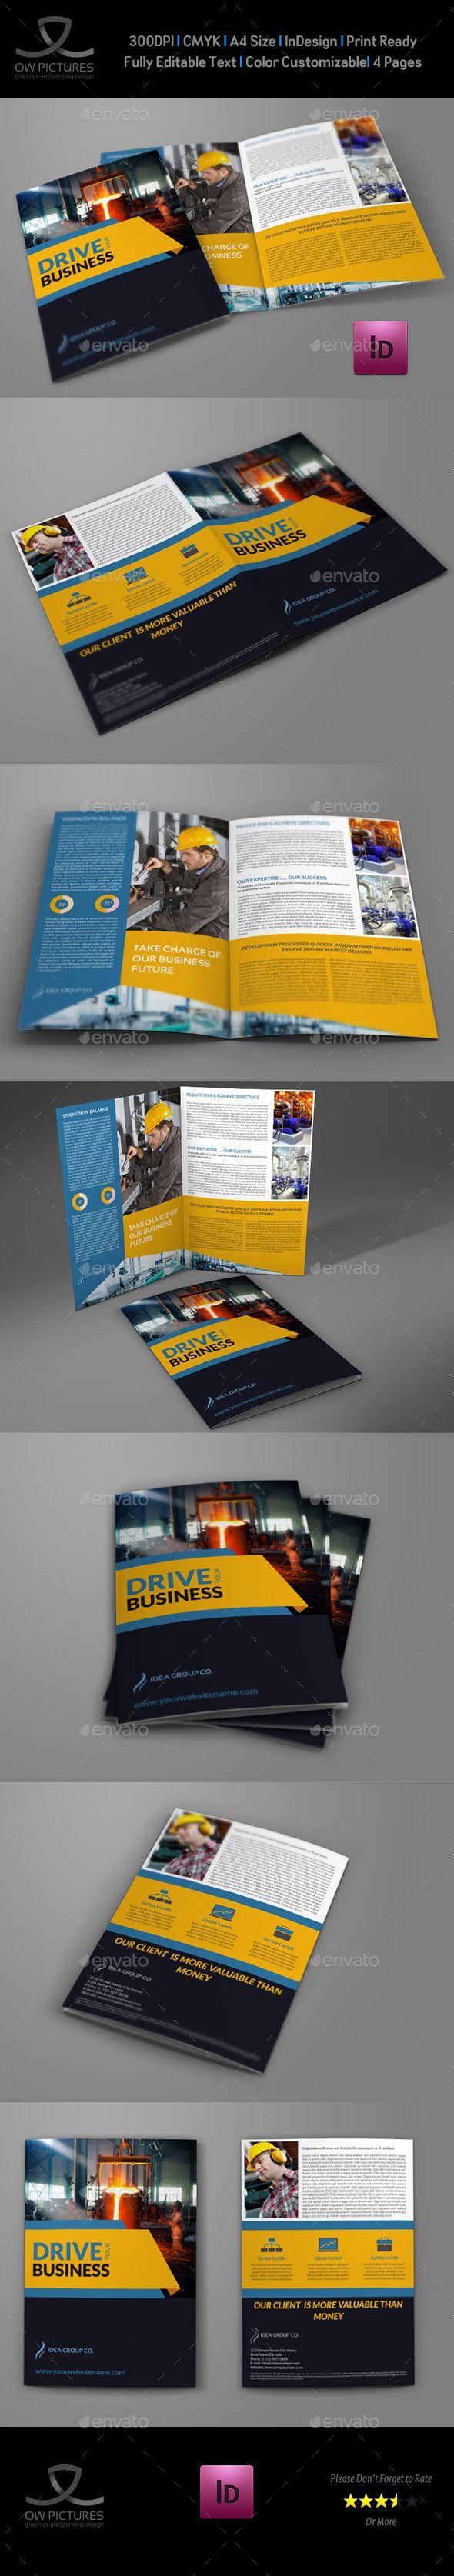 Industrial Company Brochure Bi-Fold Template Vol2